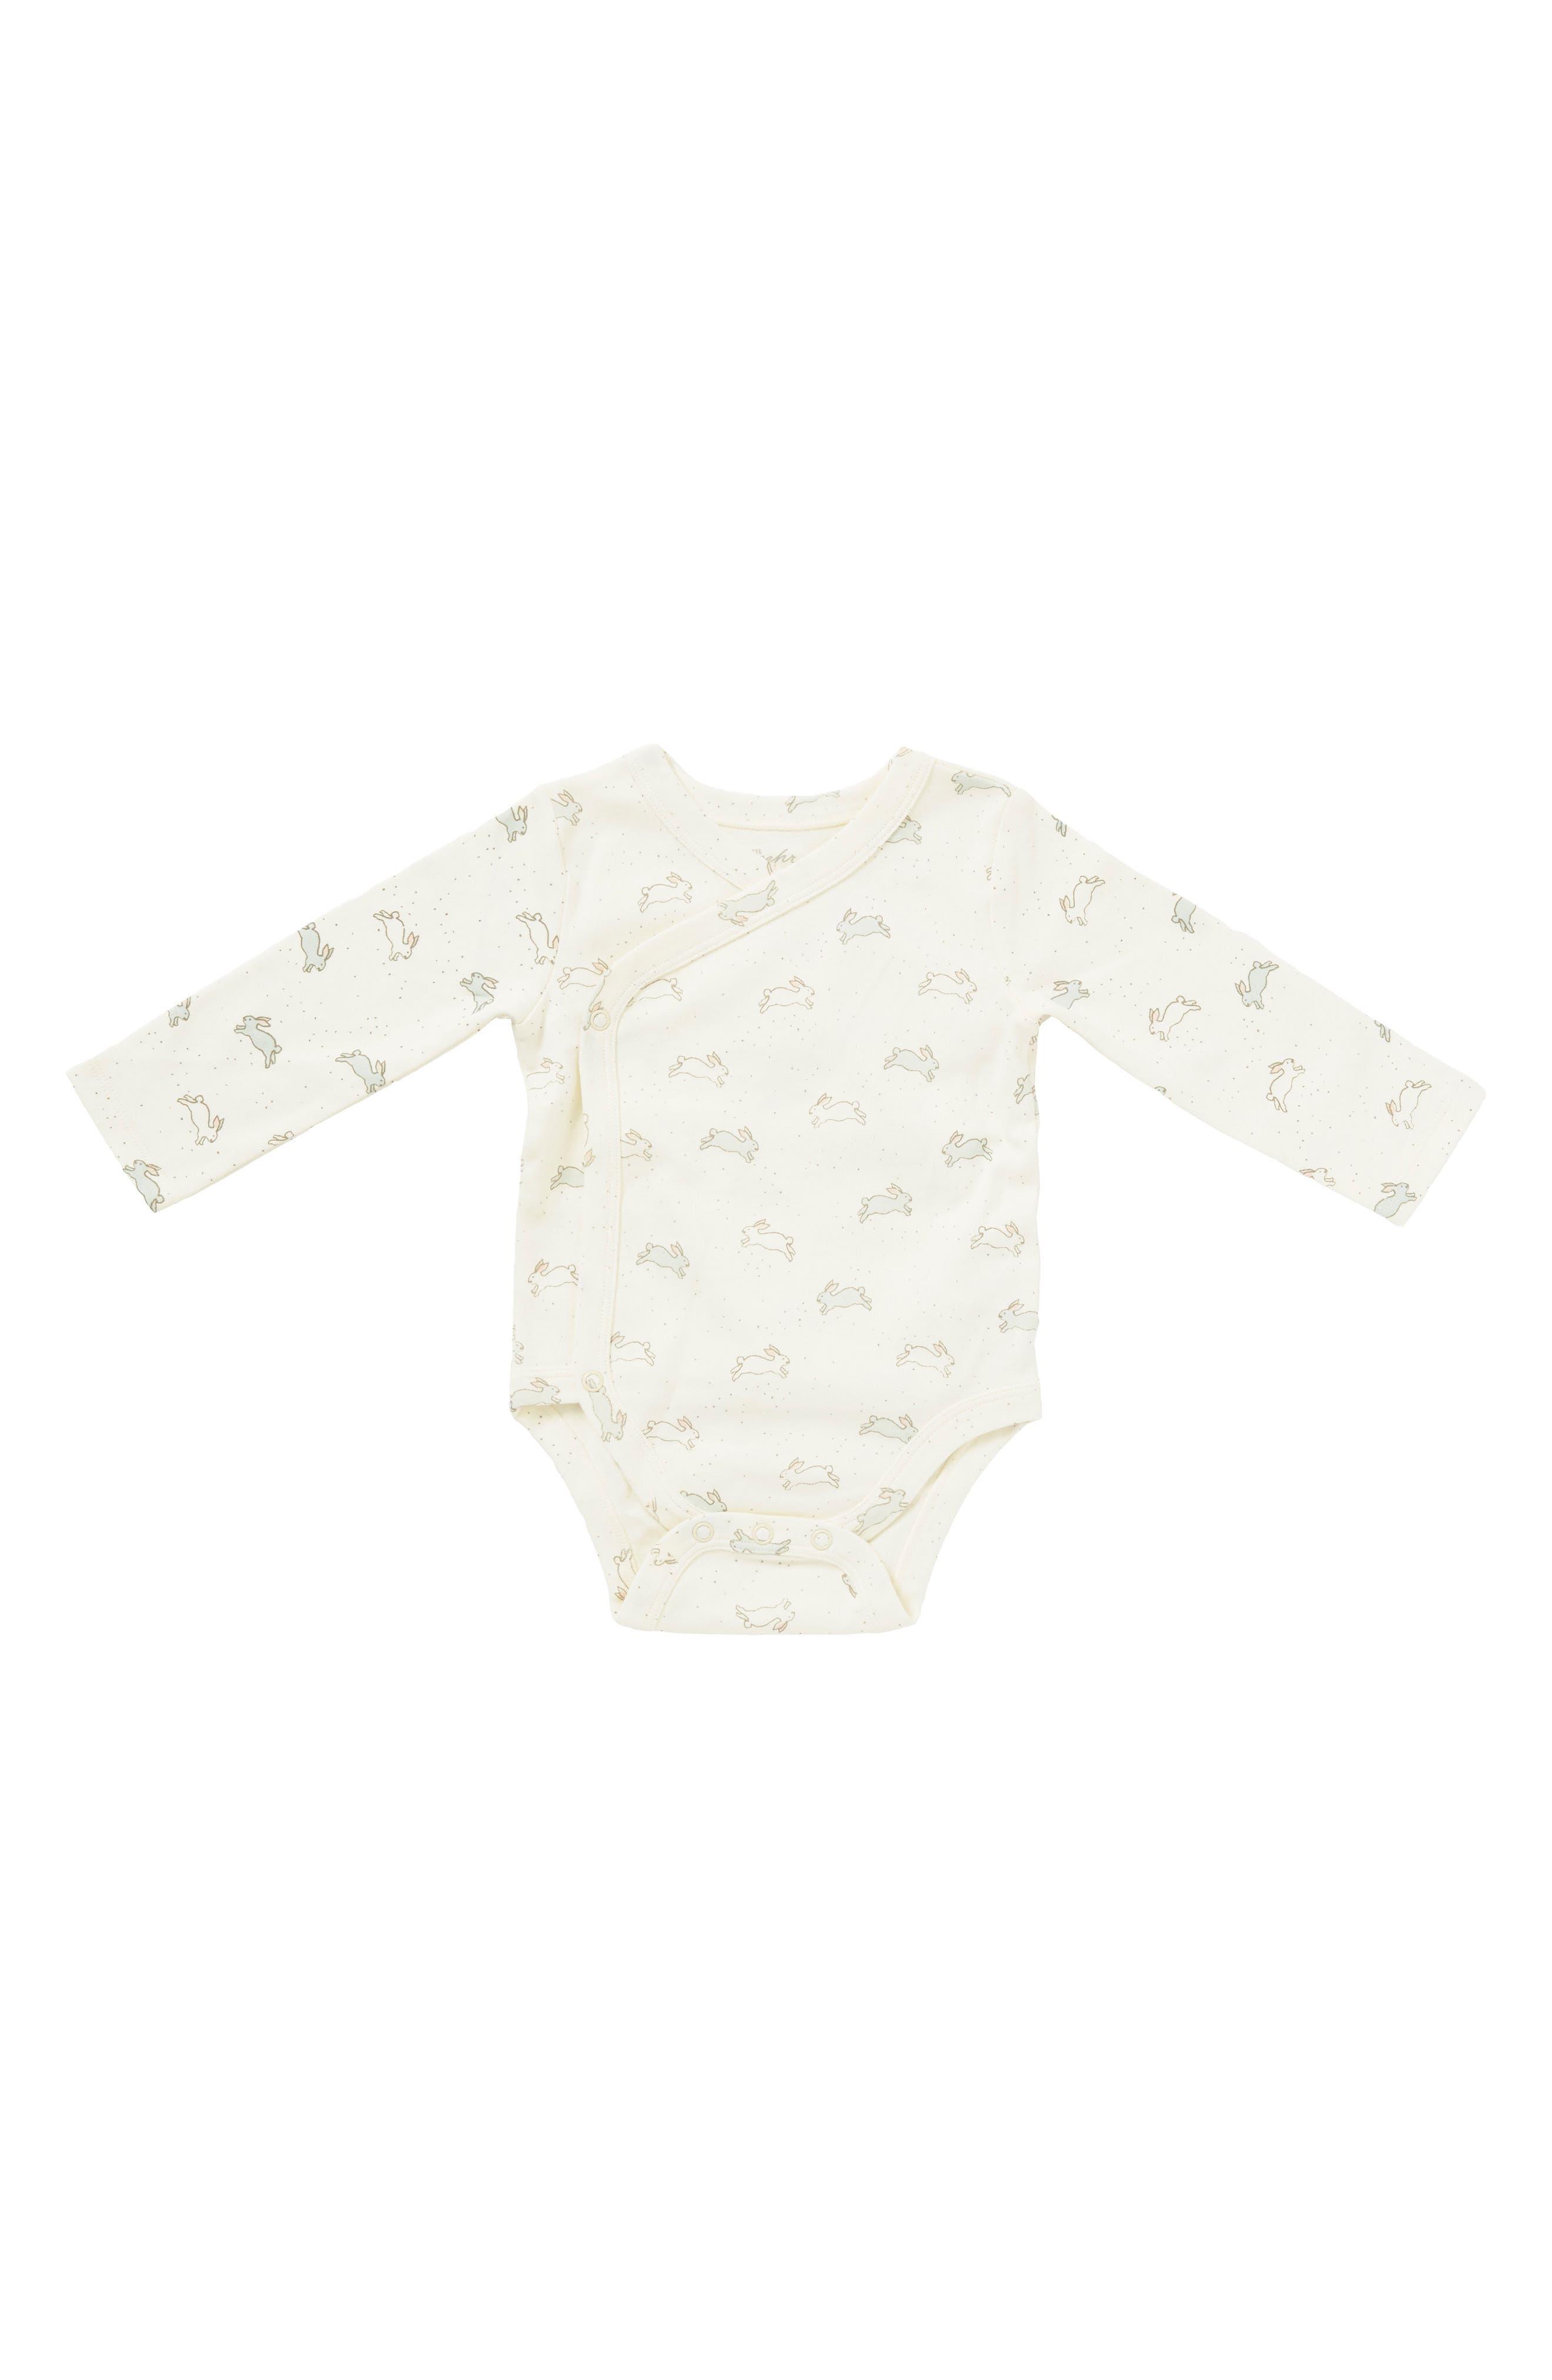 Alternate Image 1 Selected - Petit Pehr Tiny Bunny Bodysuit (Baby)